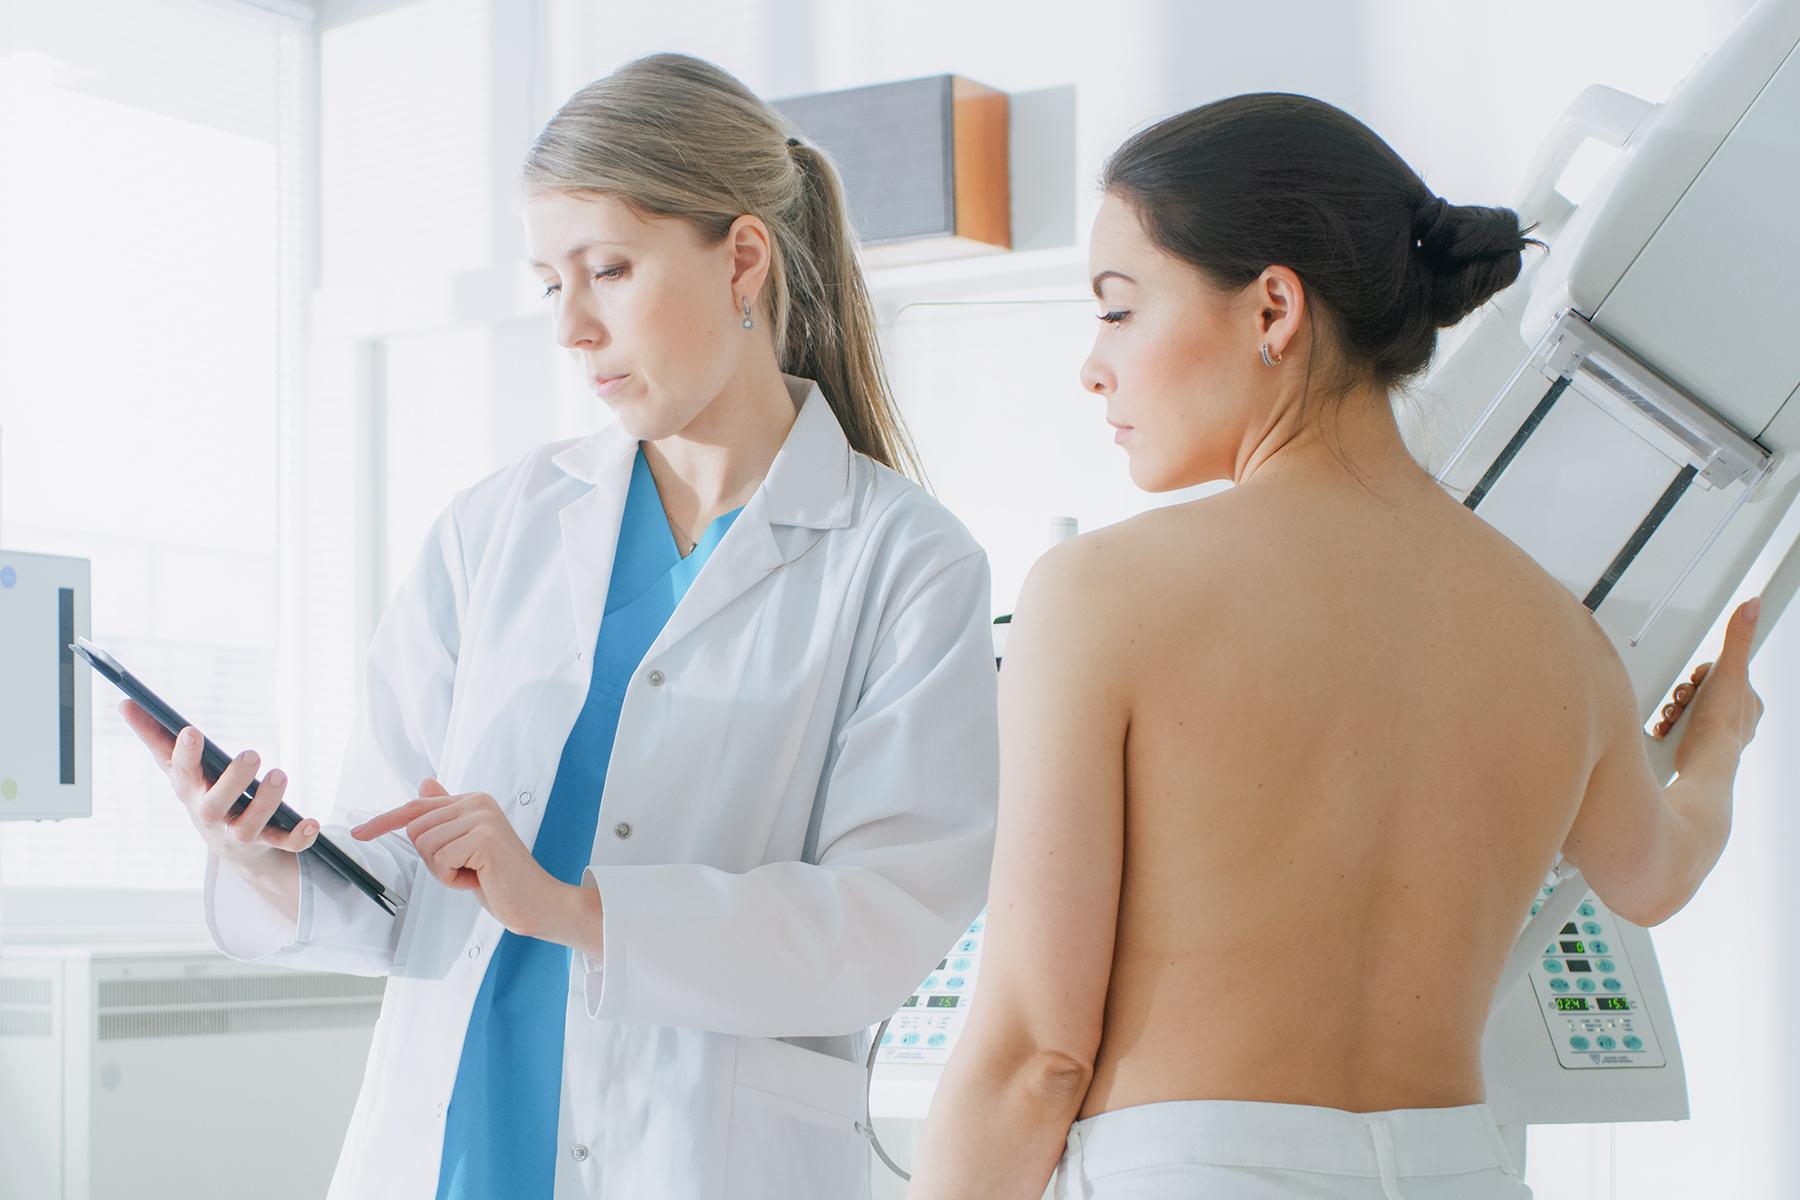 Doctor adjusting mammogram machine for a patient